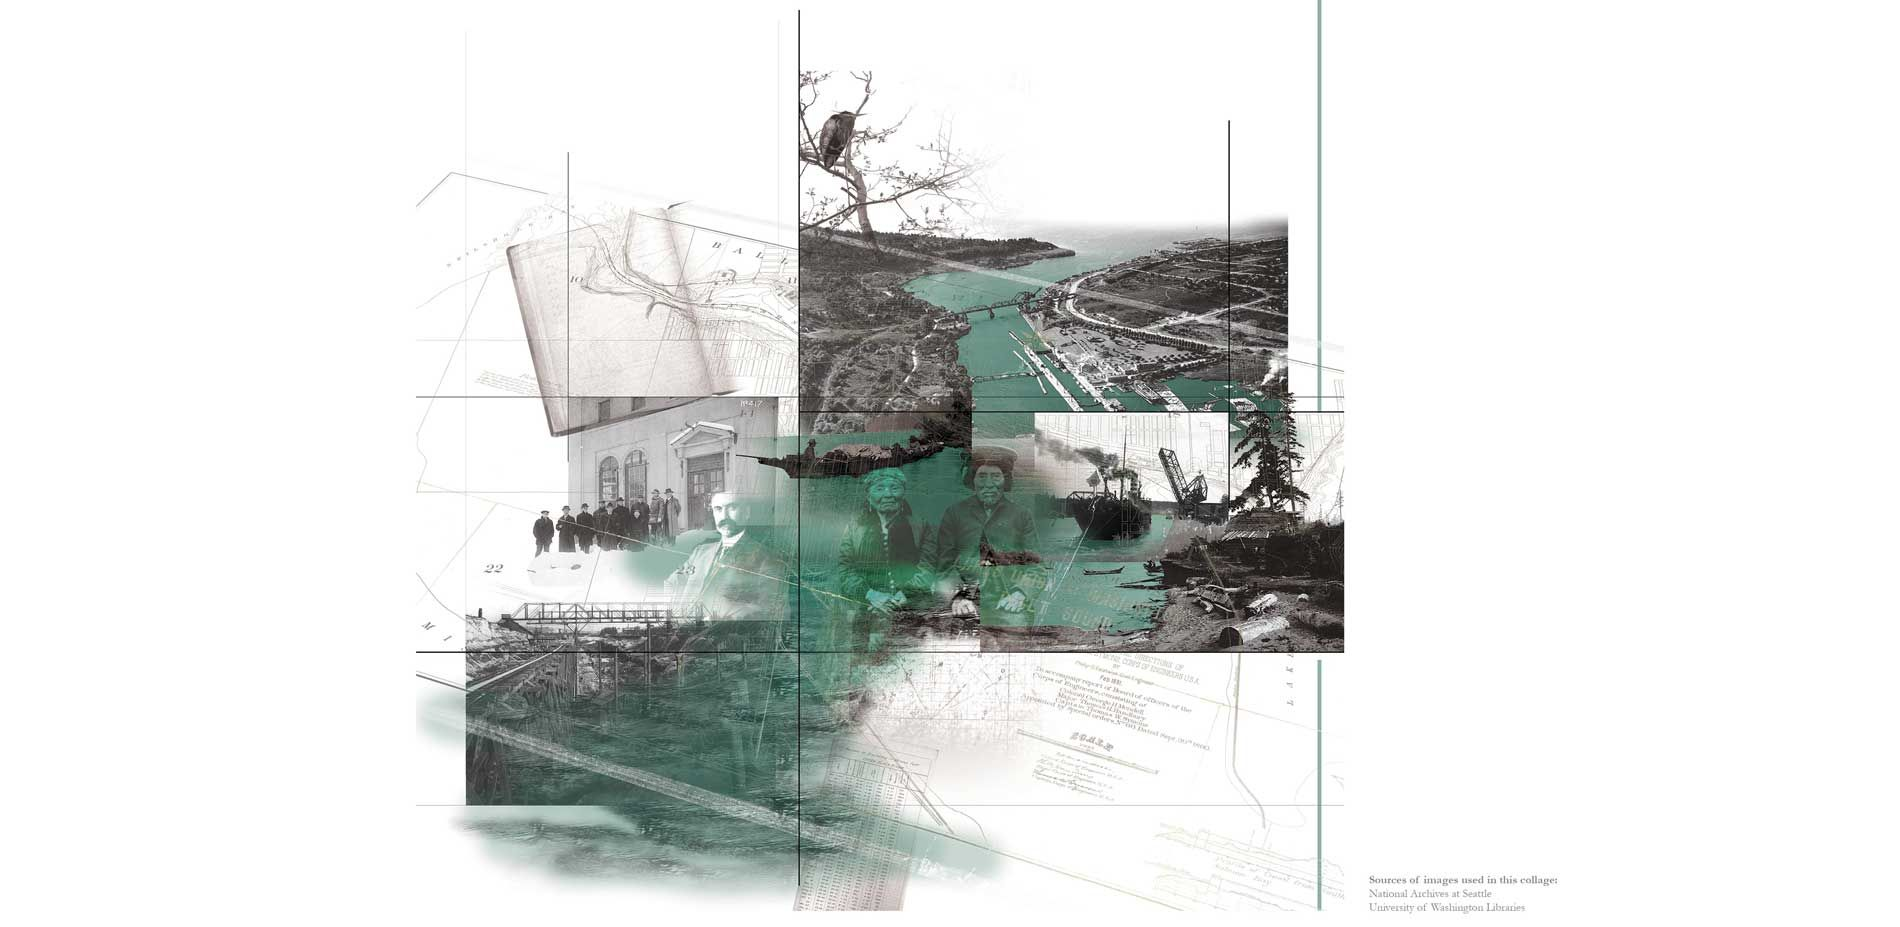 Concrete Nurse Logs Spawning Biodiversity From Ballard S Century